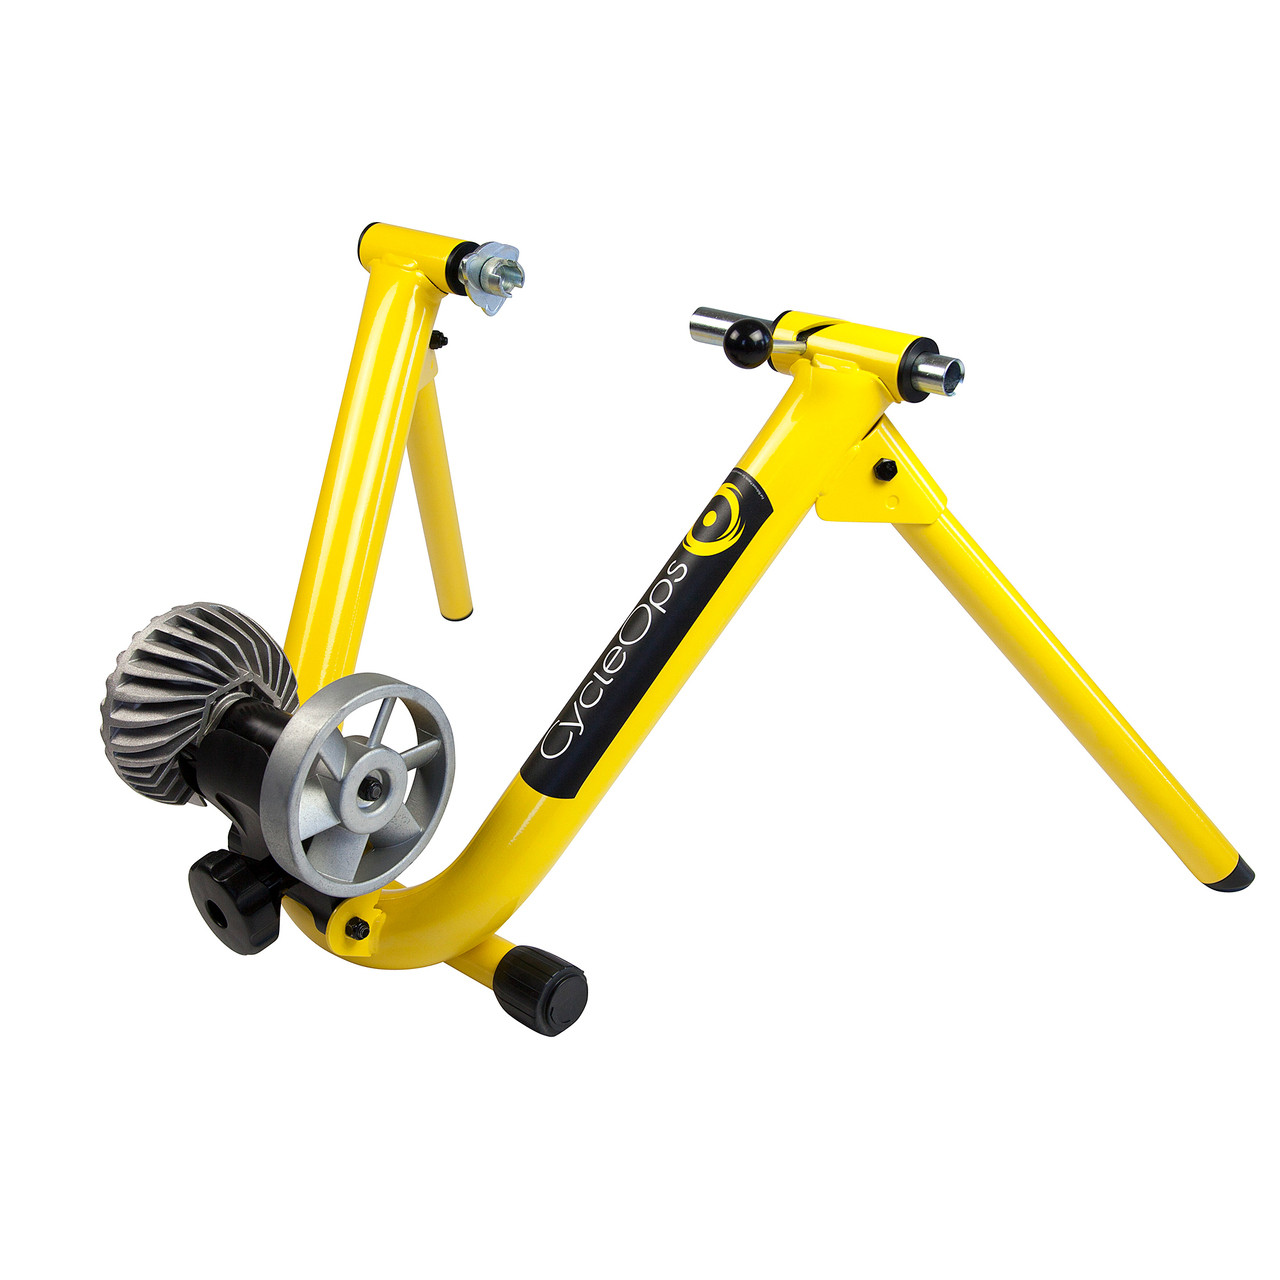 Cycleops Fluid 2 Kijiji: Cycleops Fluid Indoor Trainer Yellow Virtual Tcompatible